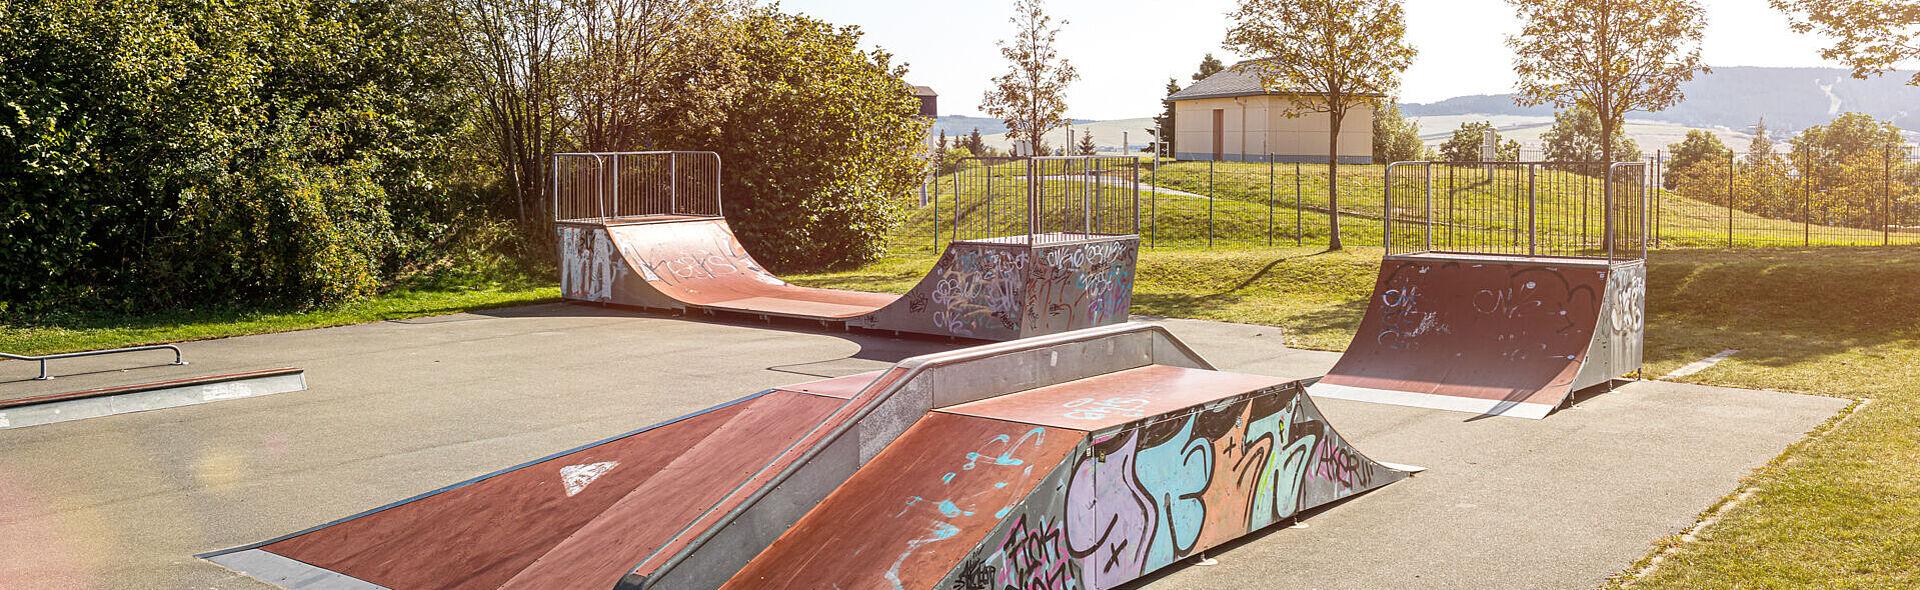 Skate-Park Skaten Oberwiesenthal Trainingszentrum